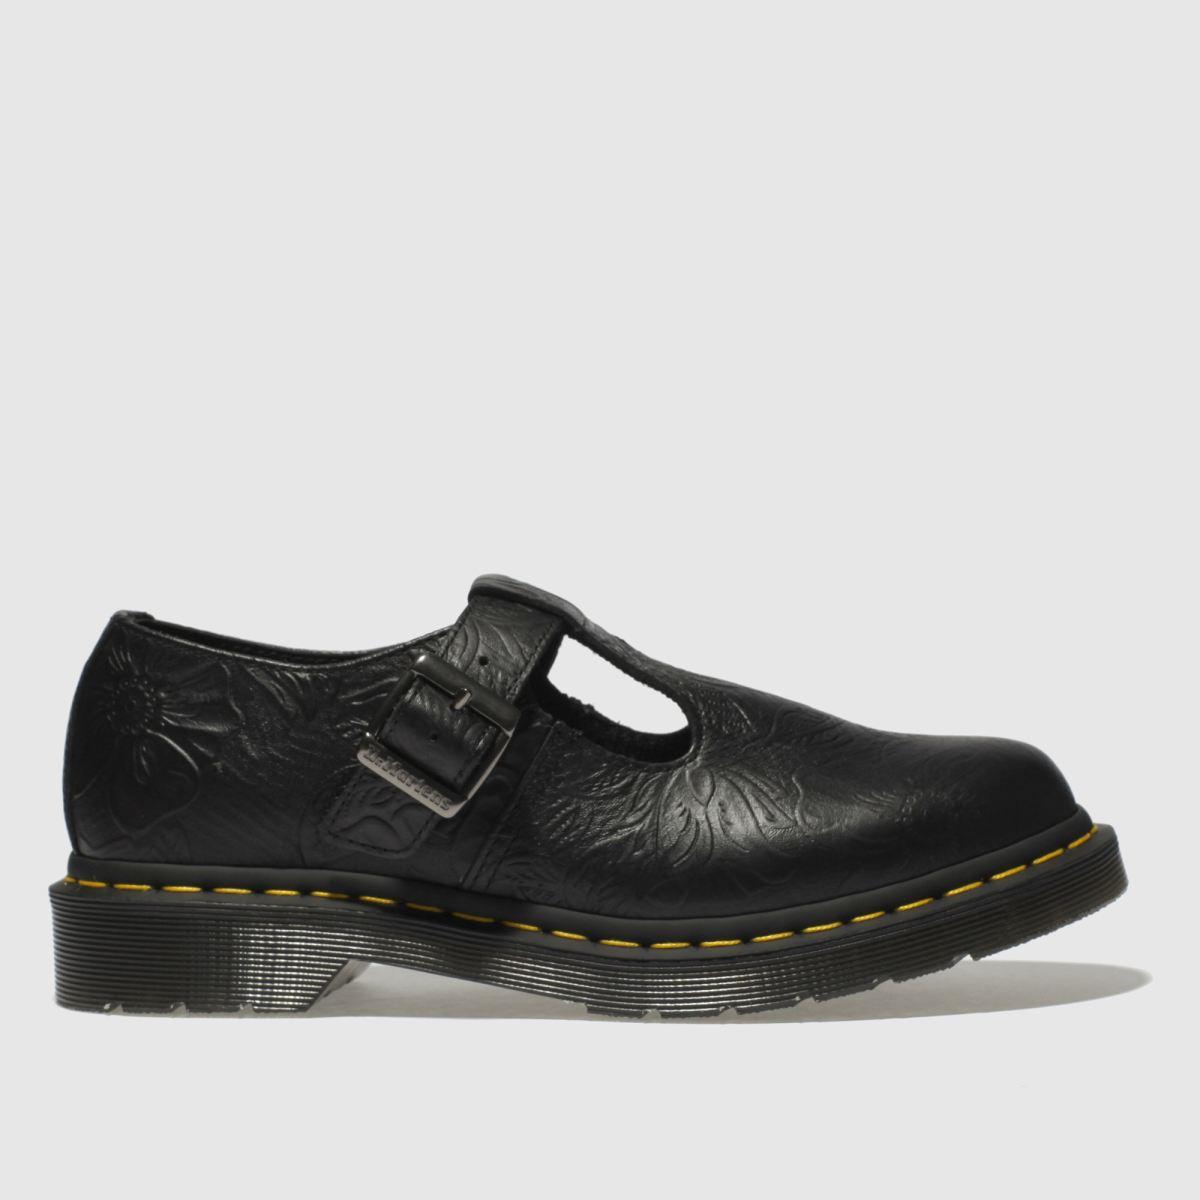 Dr Martens Black Polley Floral Emboss Flat Shoes